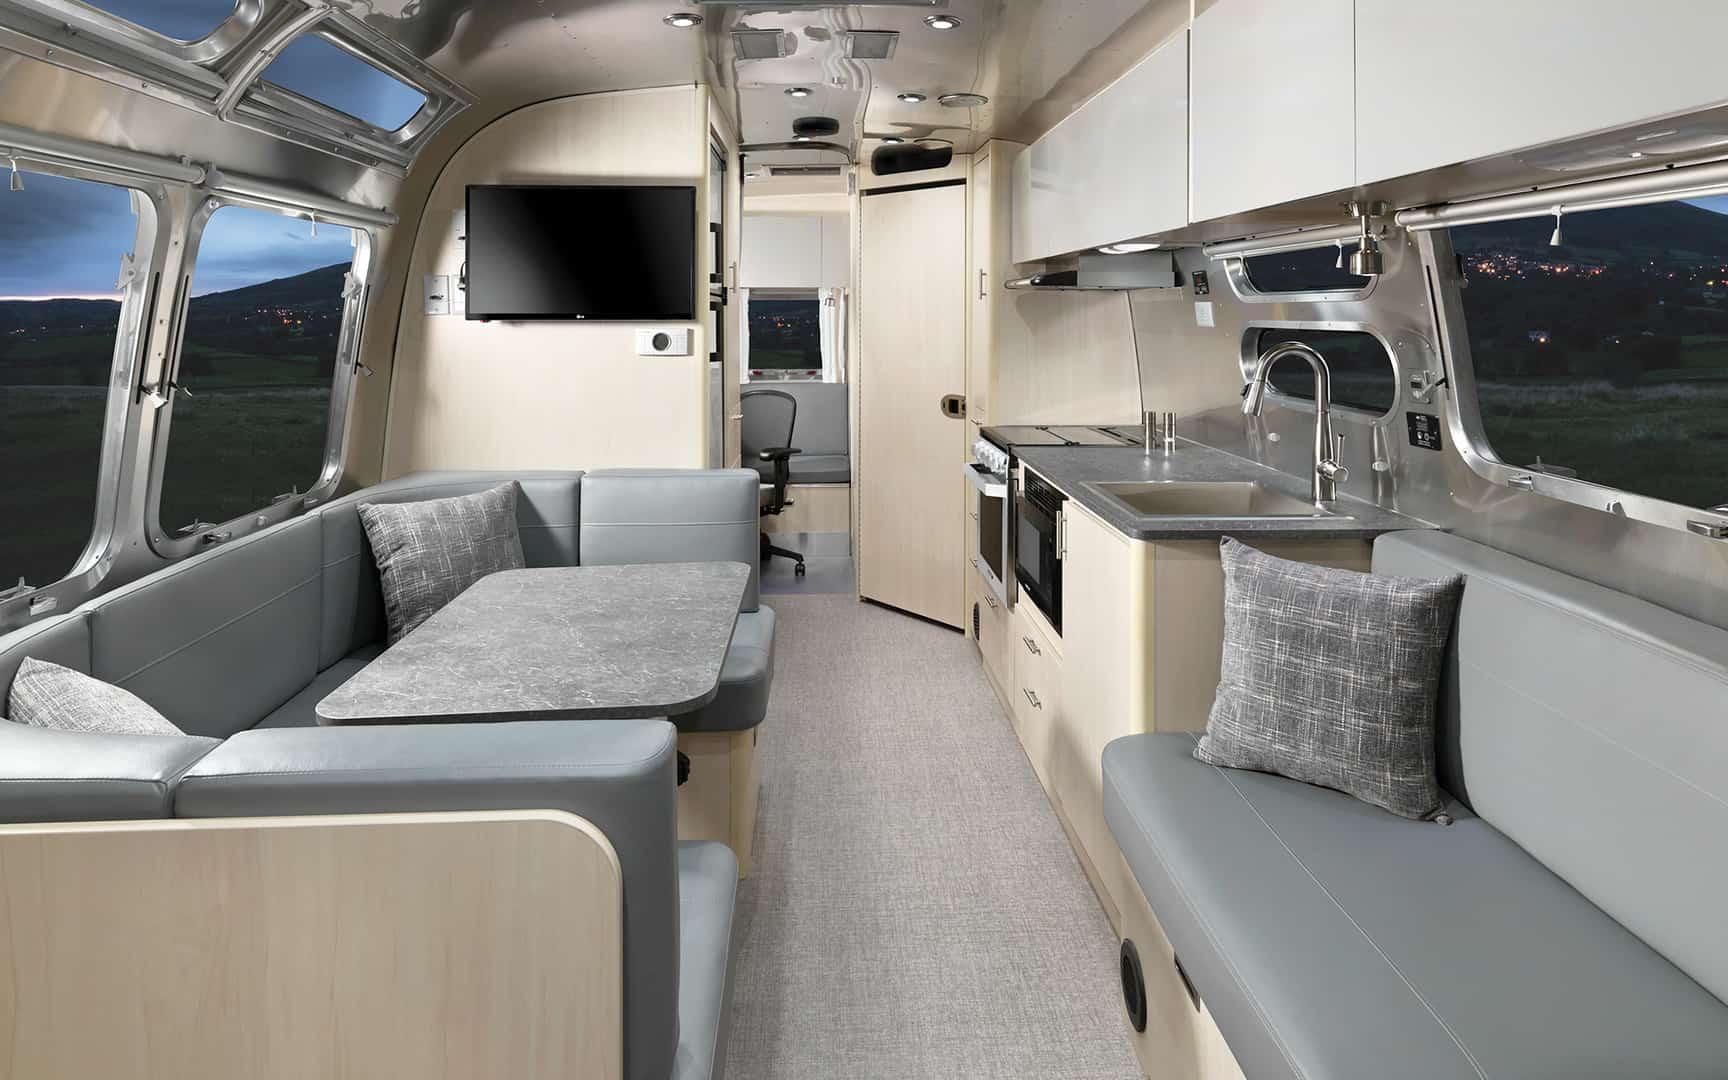 Airstream - mobilne biuro